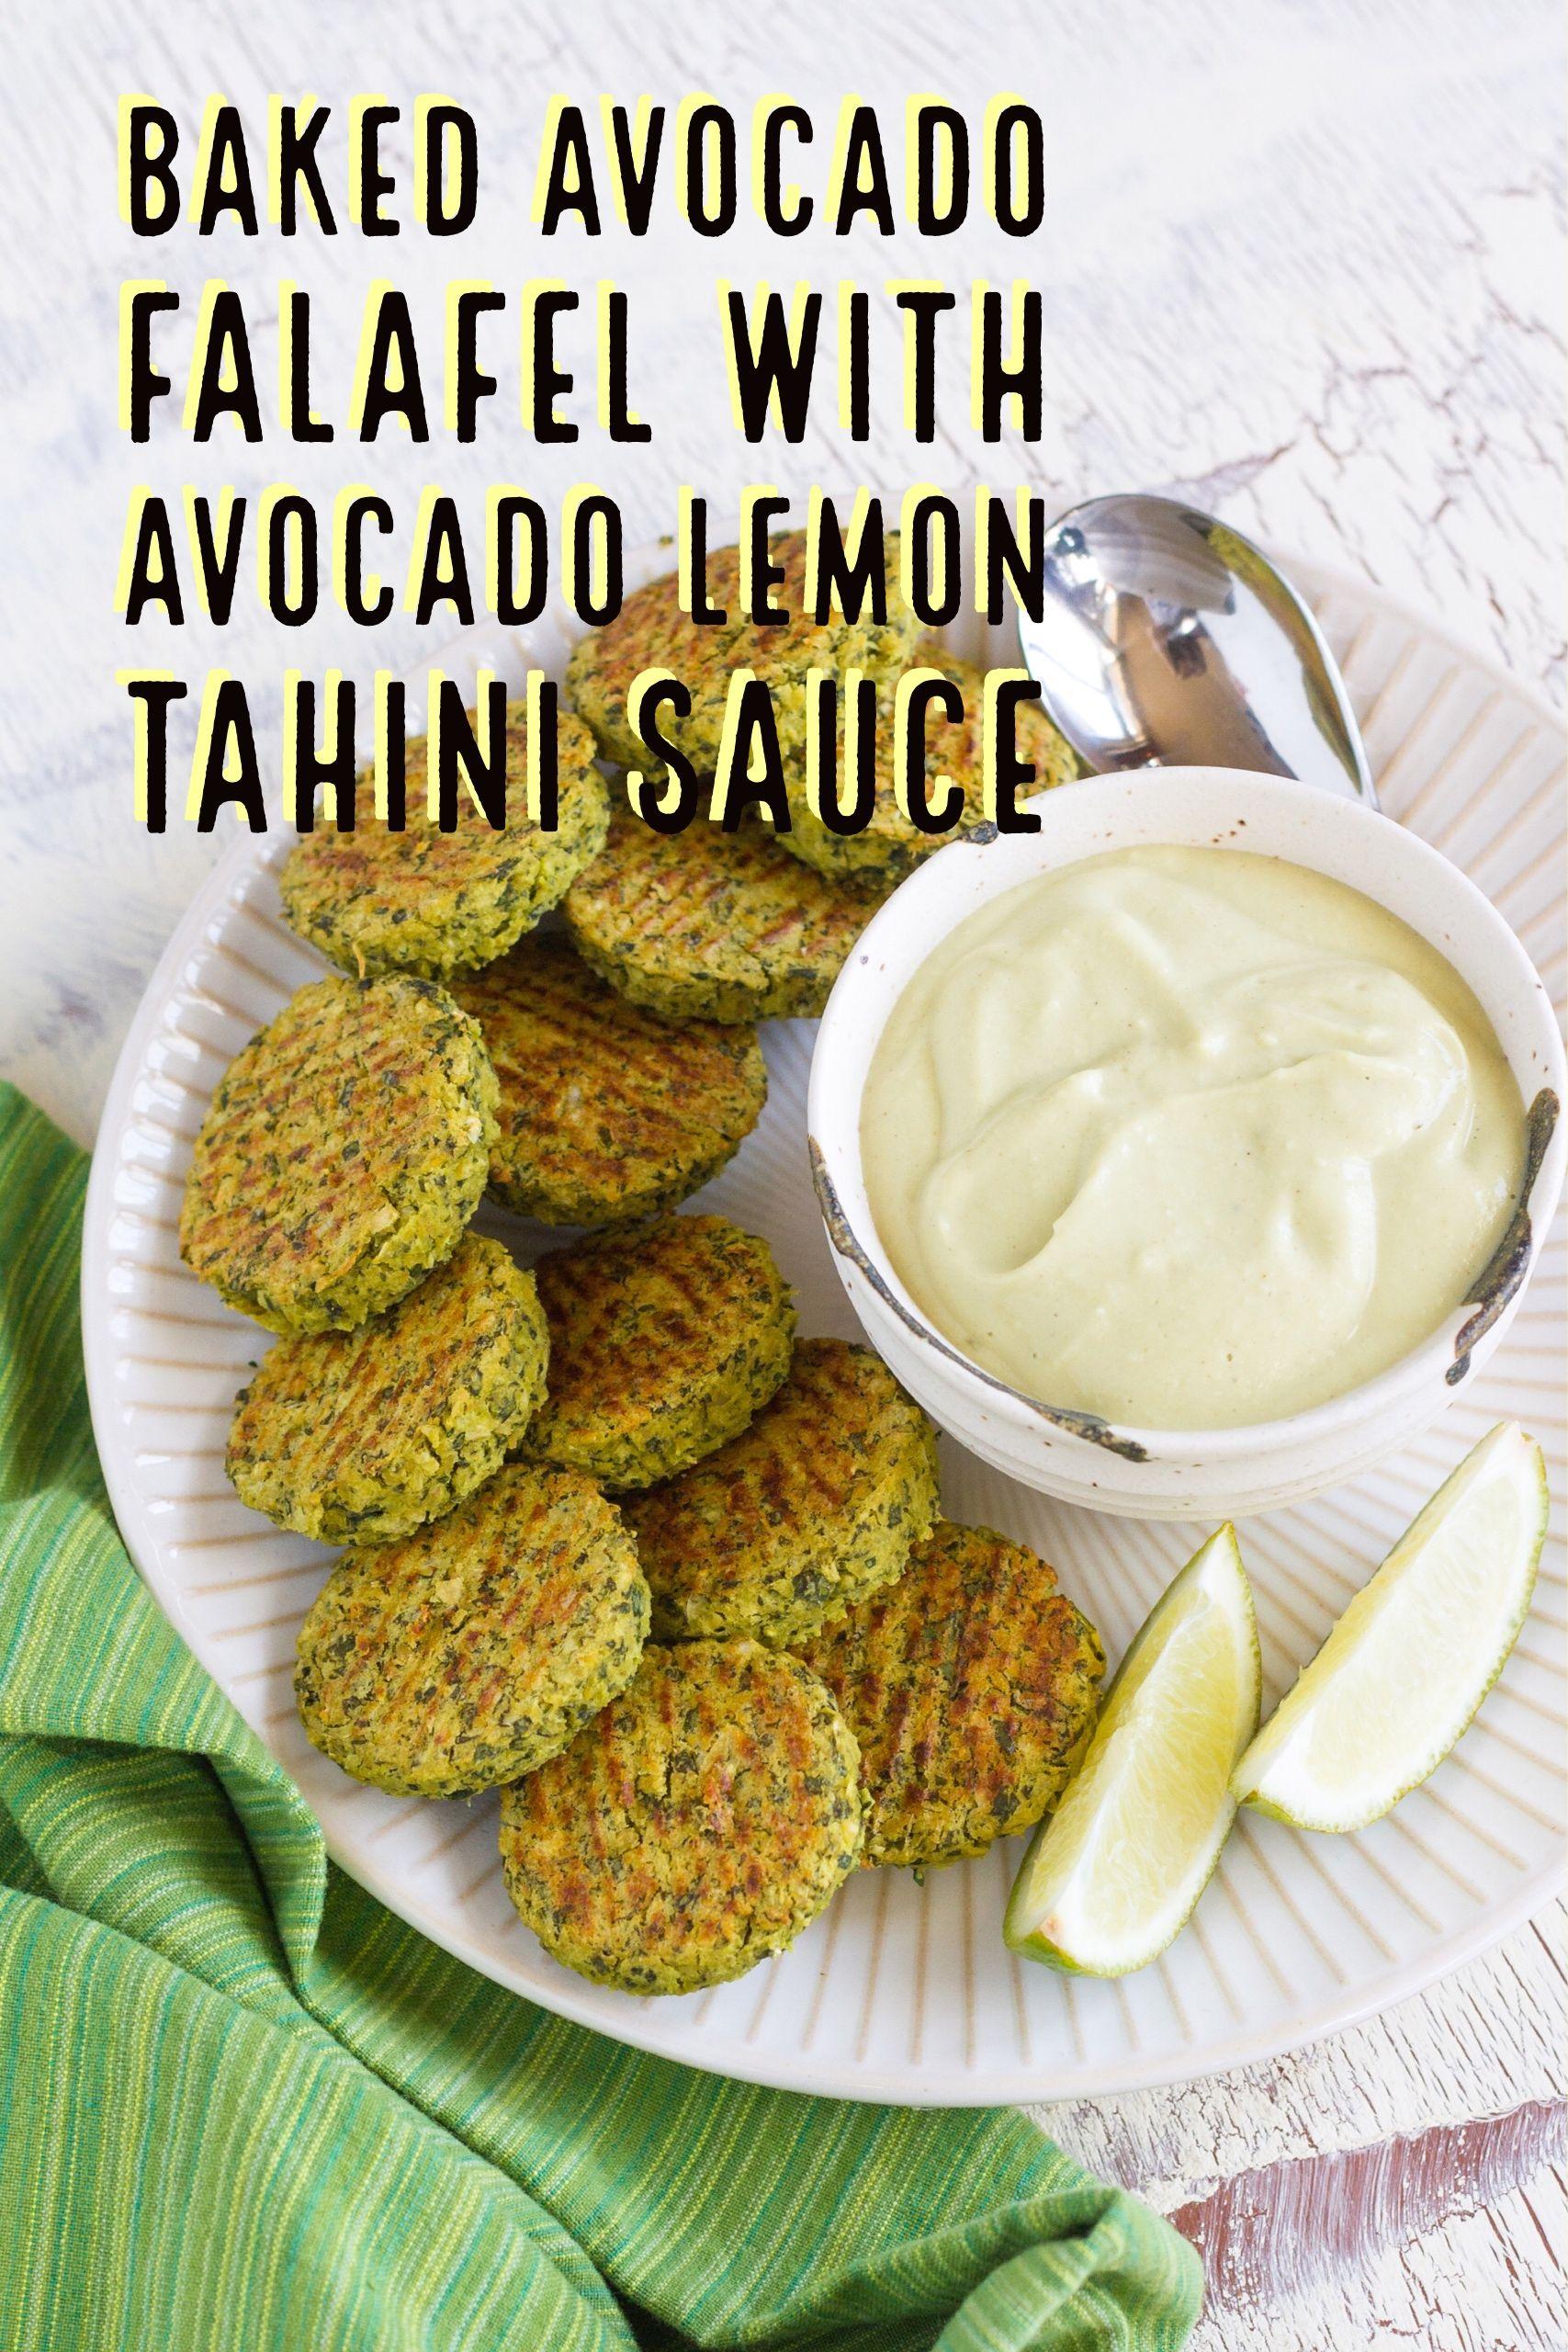 Baked Avocado Falafel With Avocado Lemon Tahini Sauce Vegan